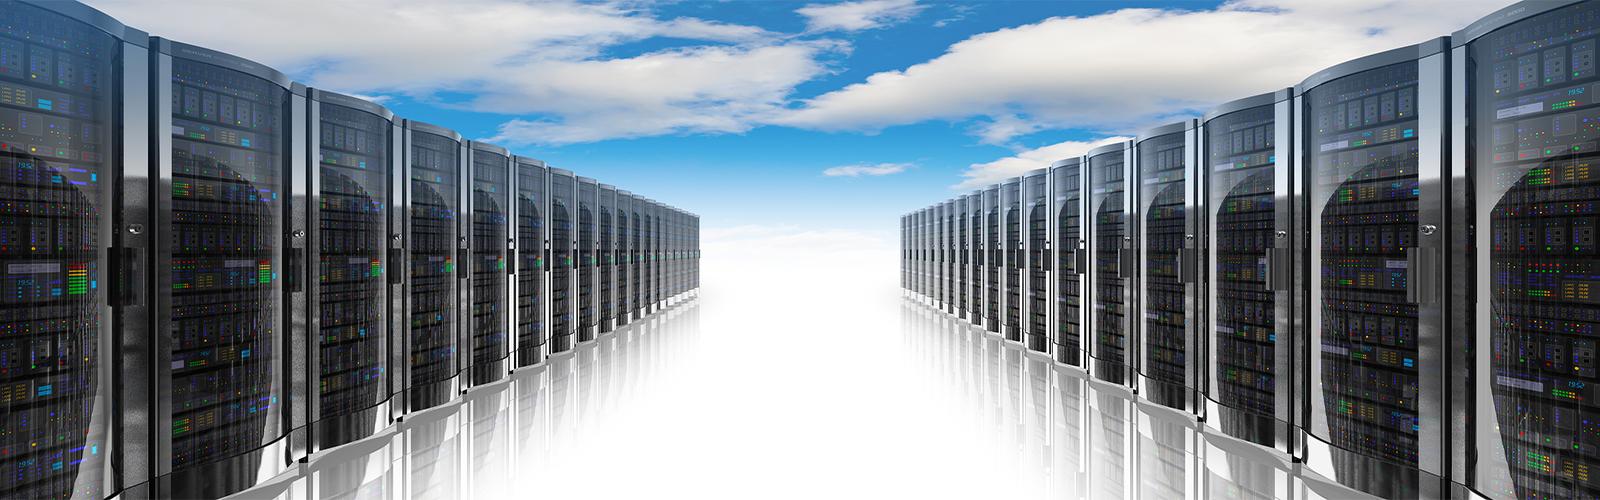 Acumatica Cloud ERP UK Vendors - Tascoli Accounting Systems Company